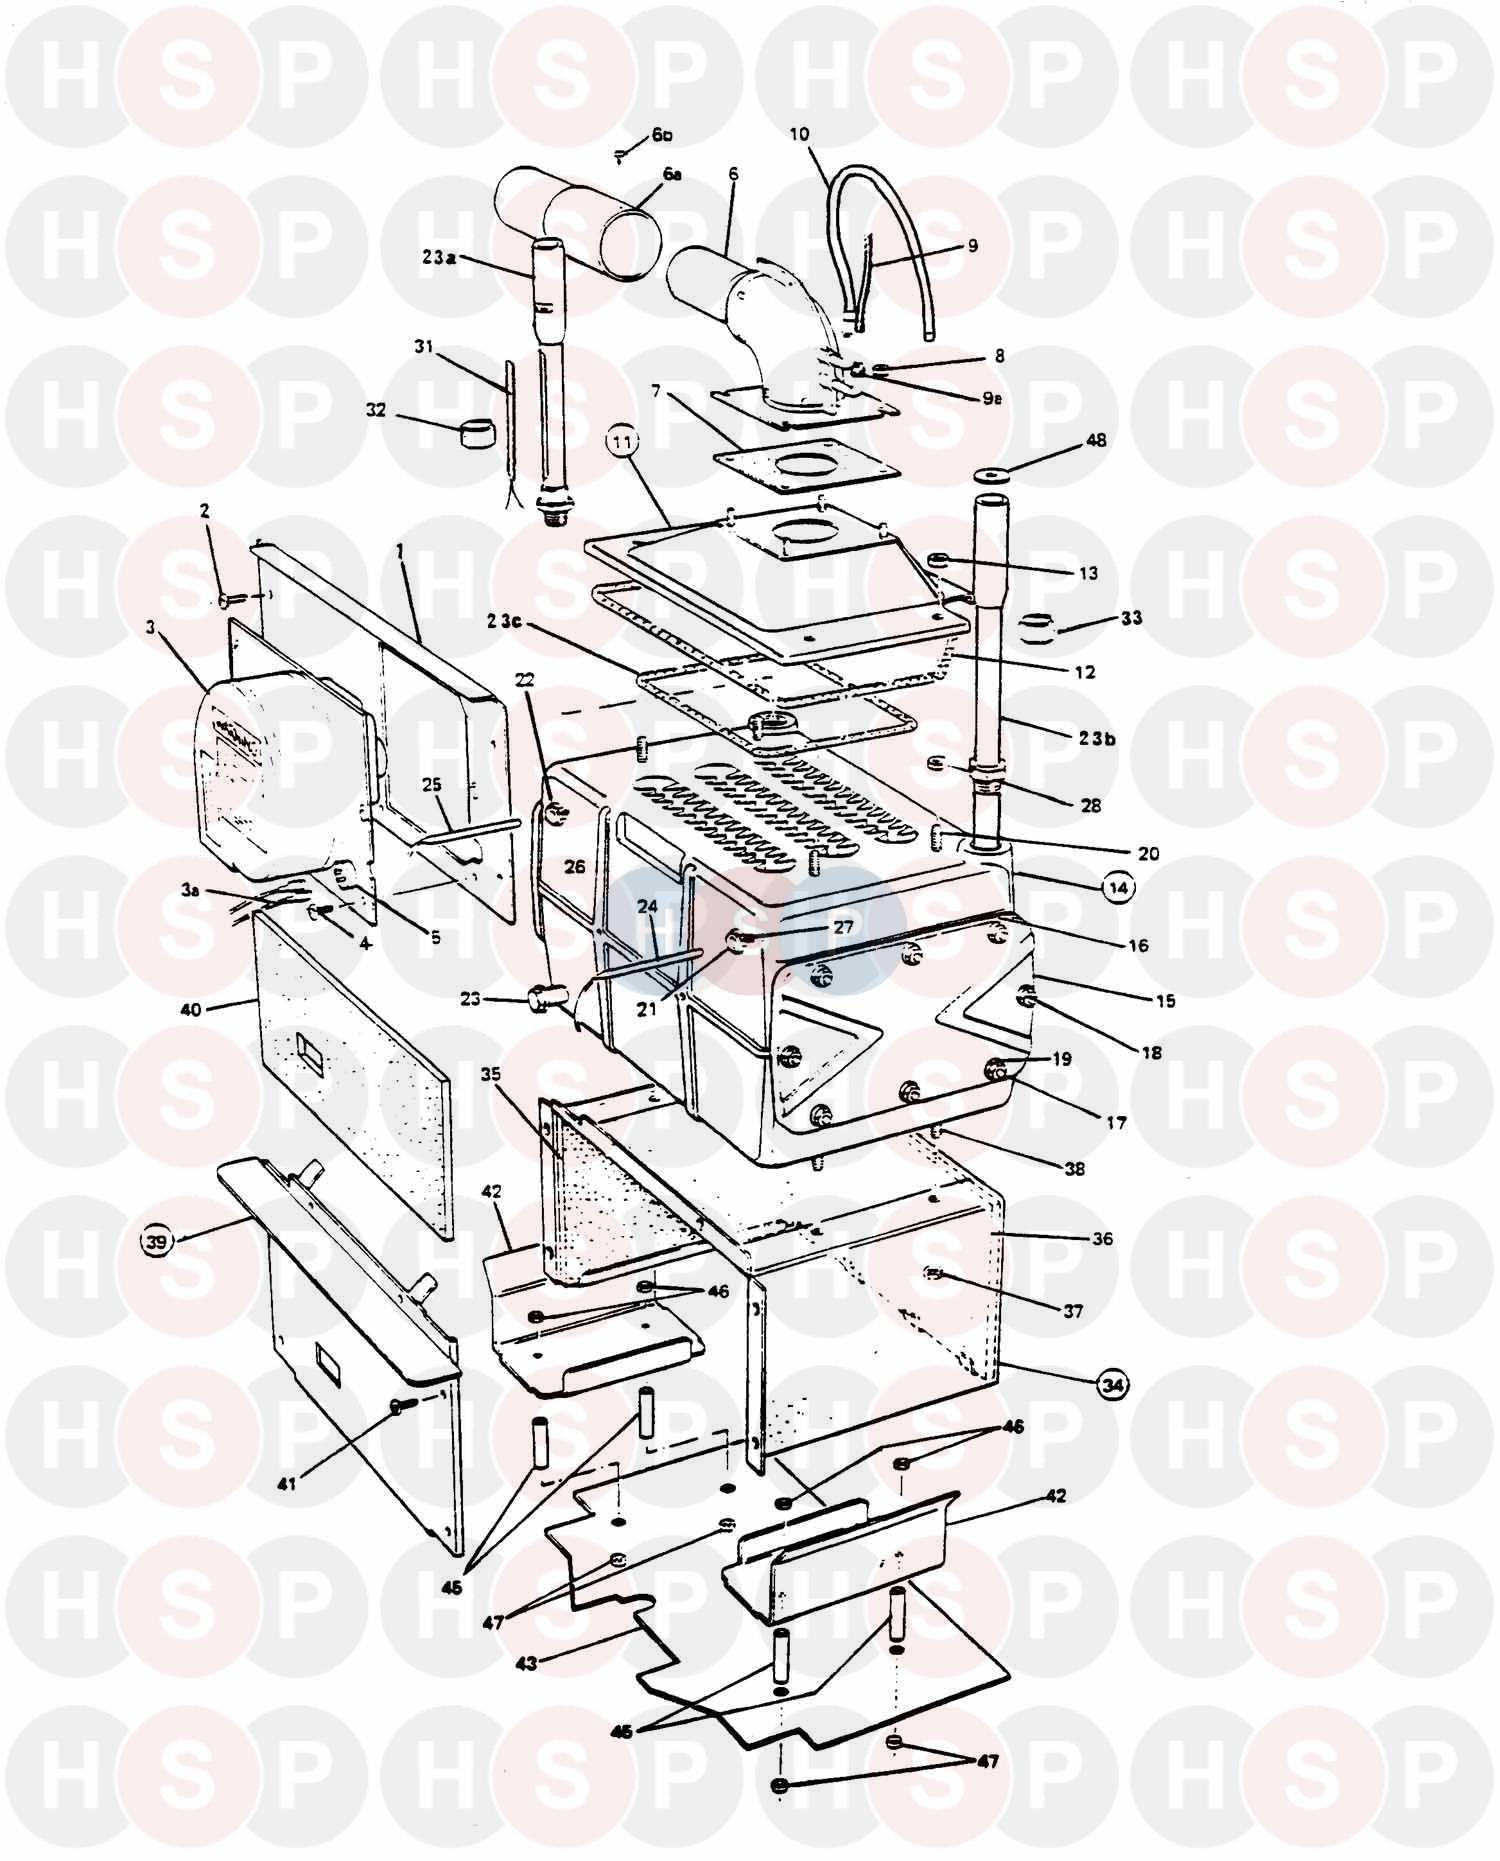 Potterton NETAHEAT PROFILE 50E Appliance Diagram (Boiler